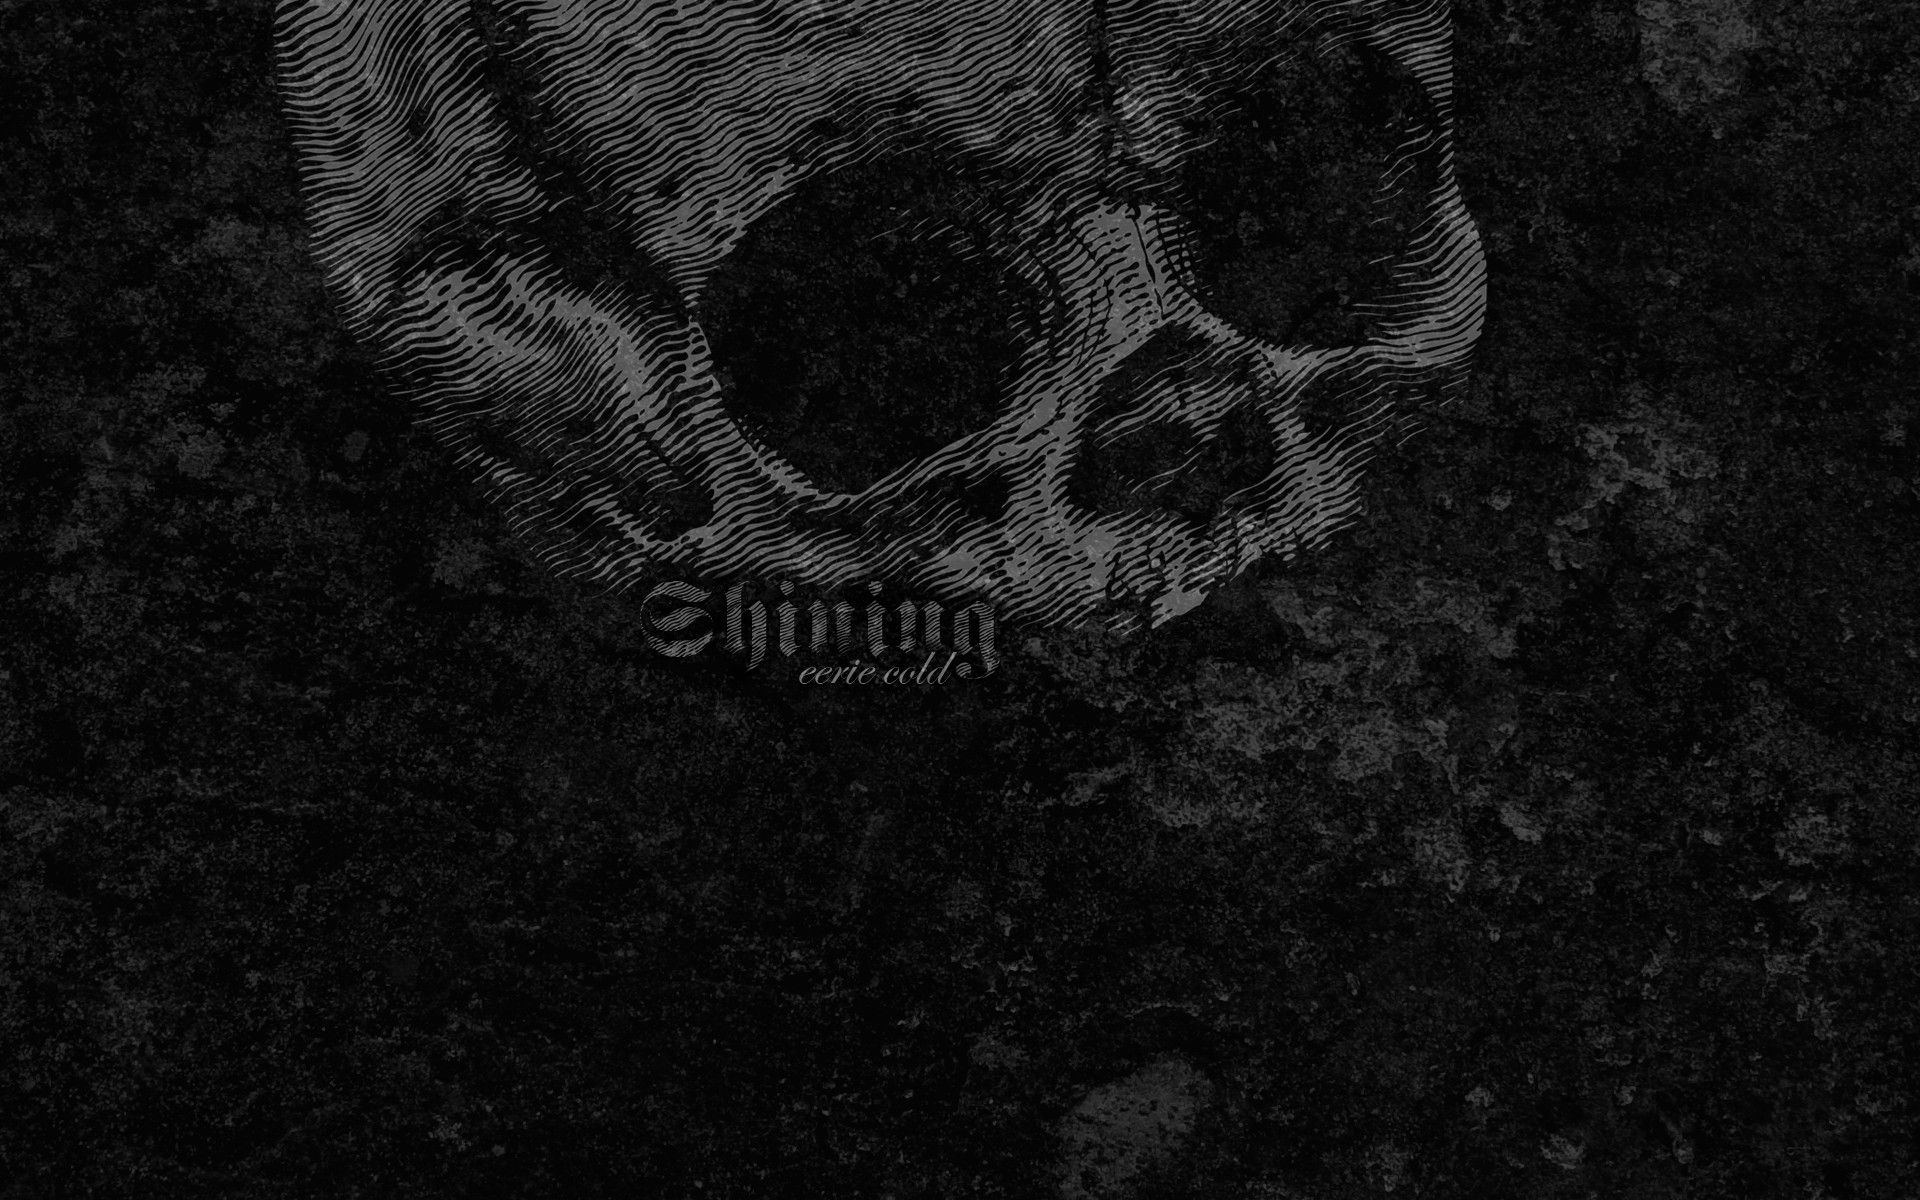 Metal music background - Jpg 1920x1200 Metal Music Background